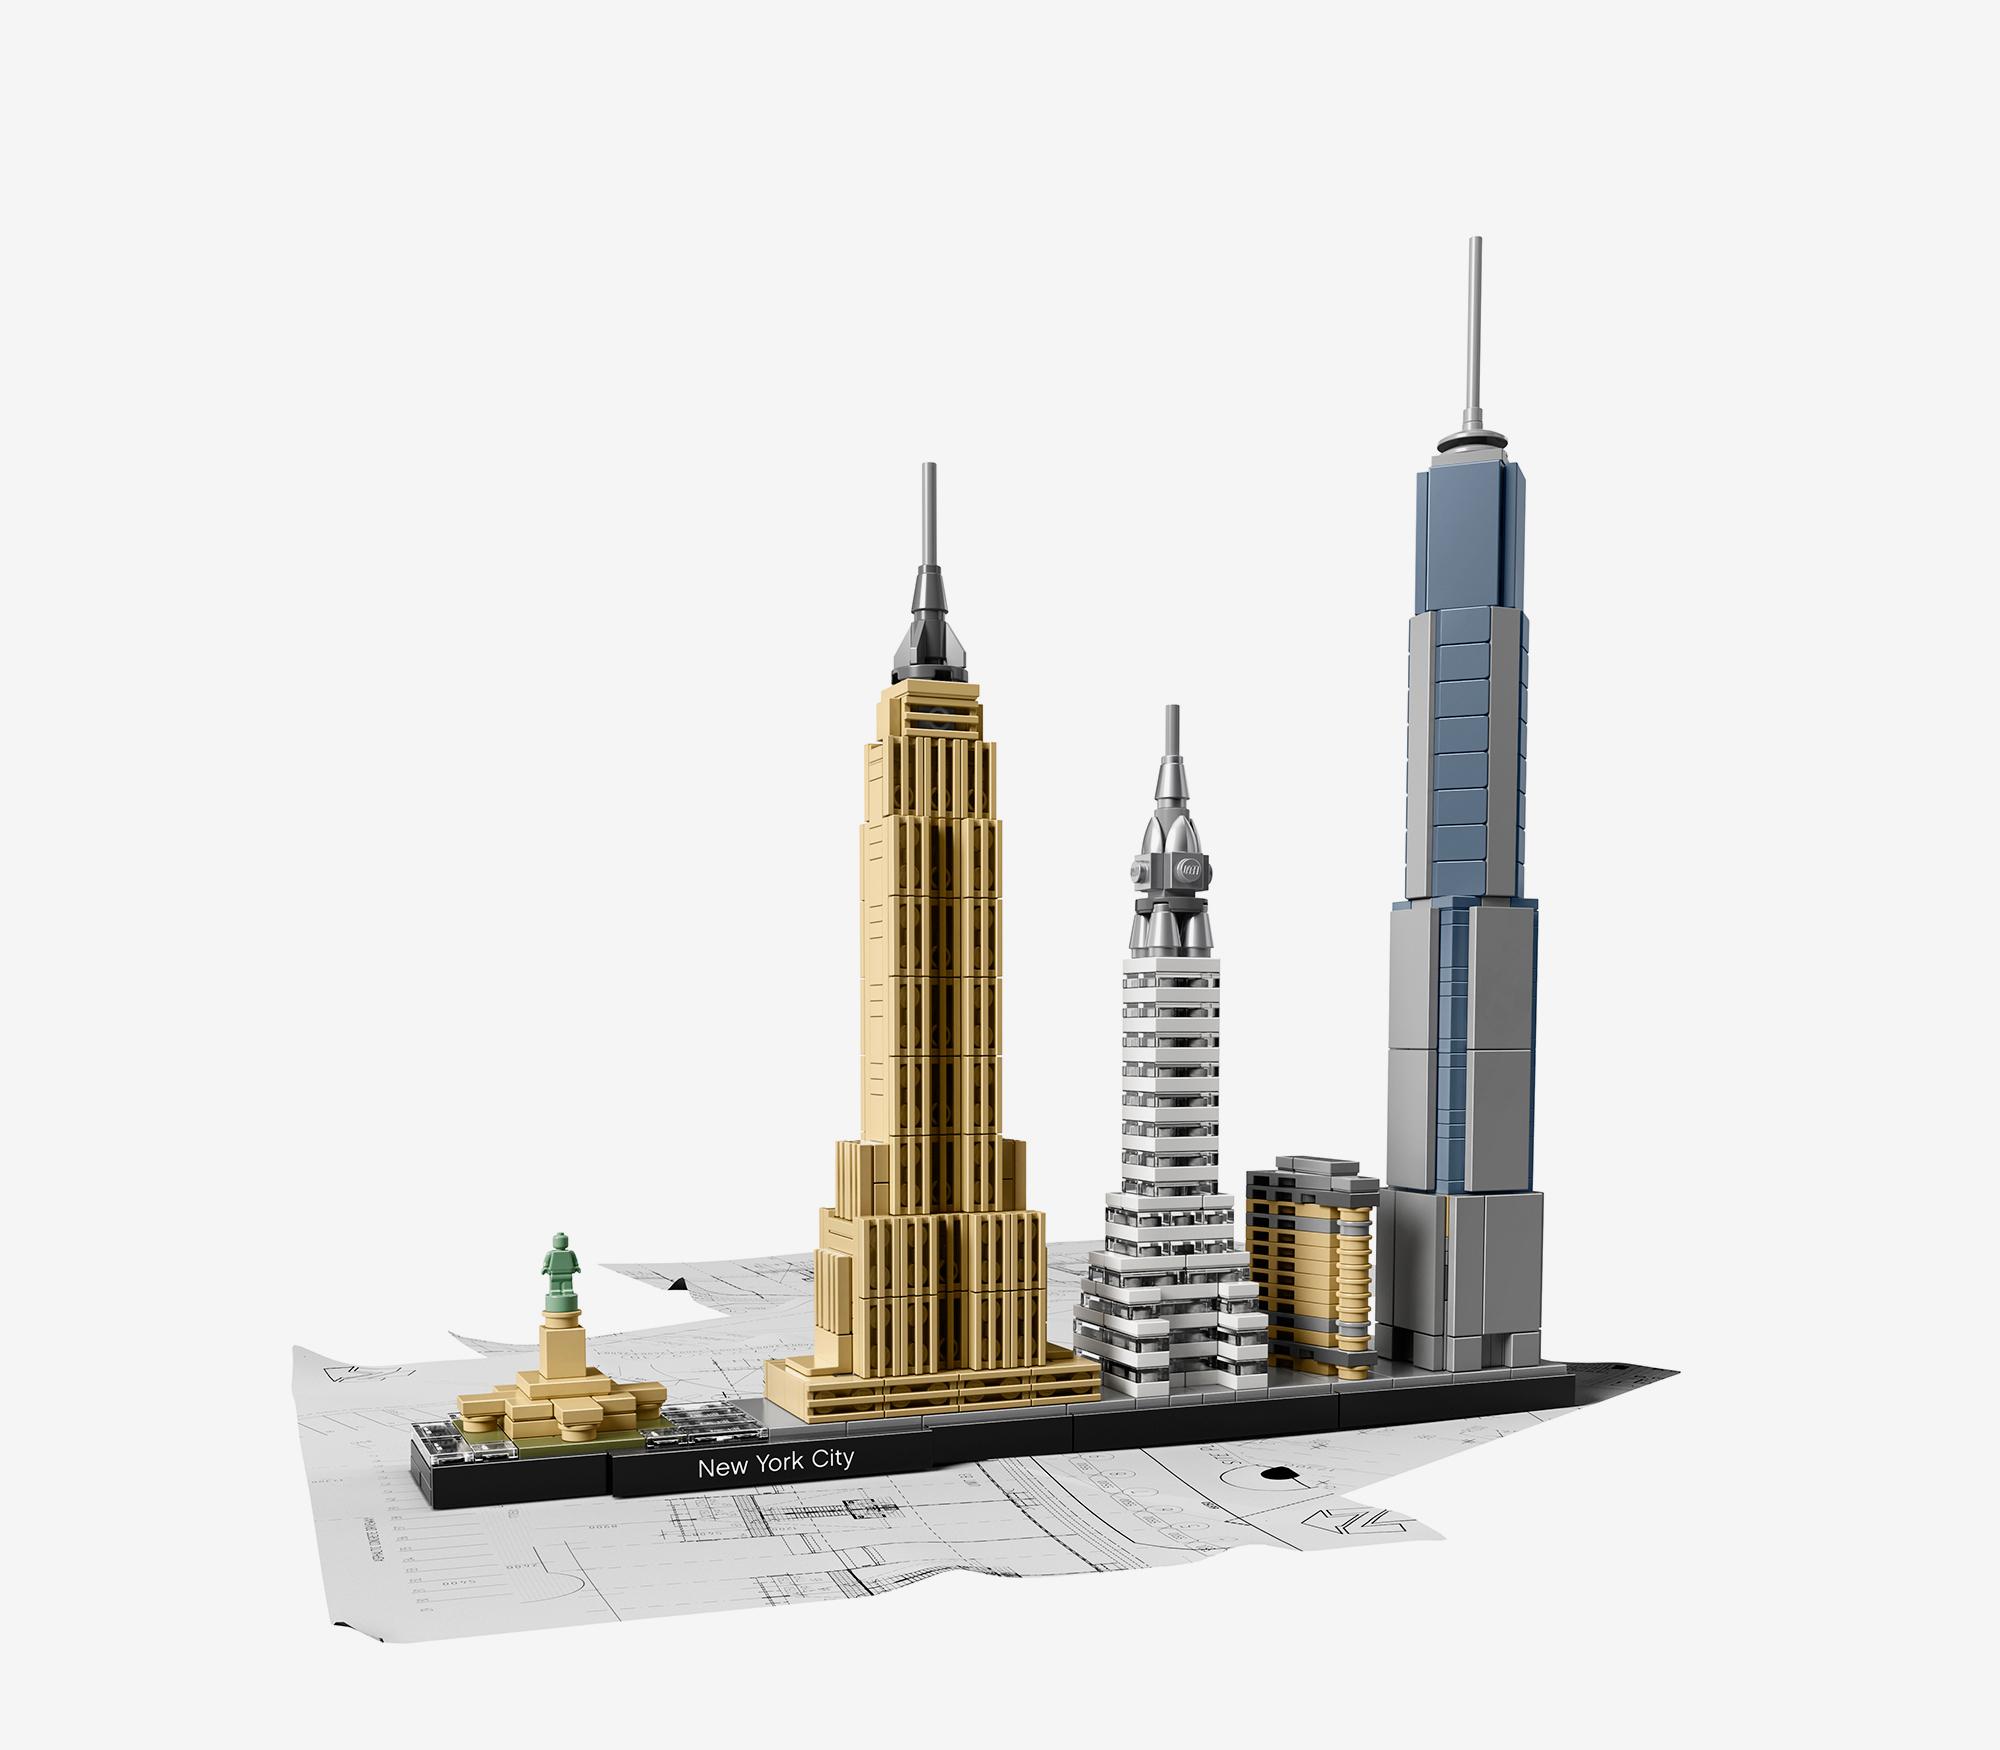 lego-city-archspeech-2